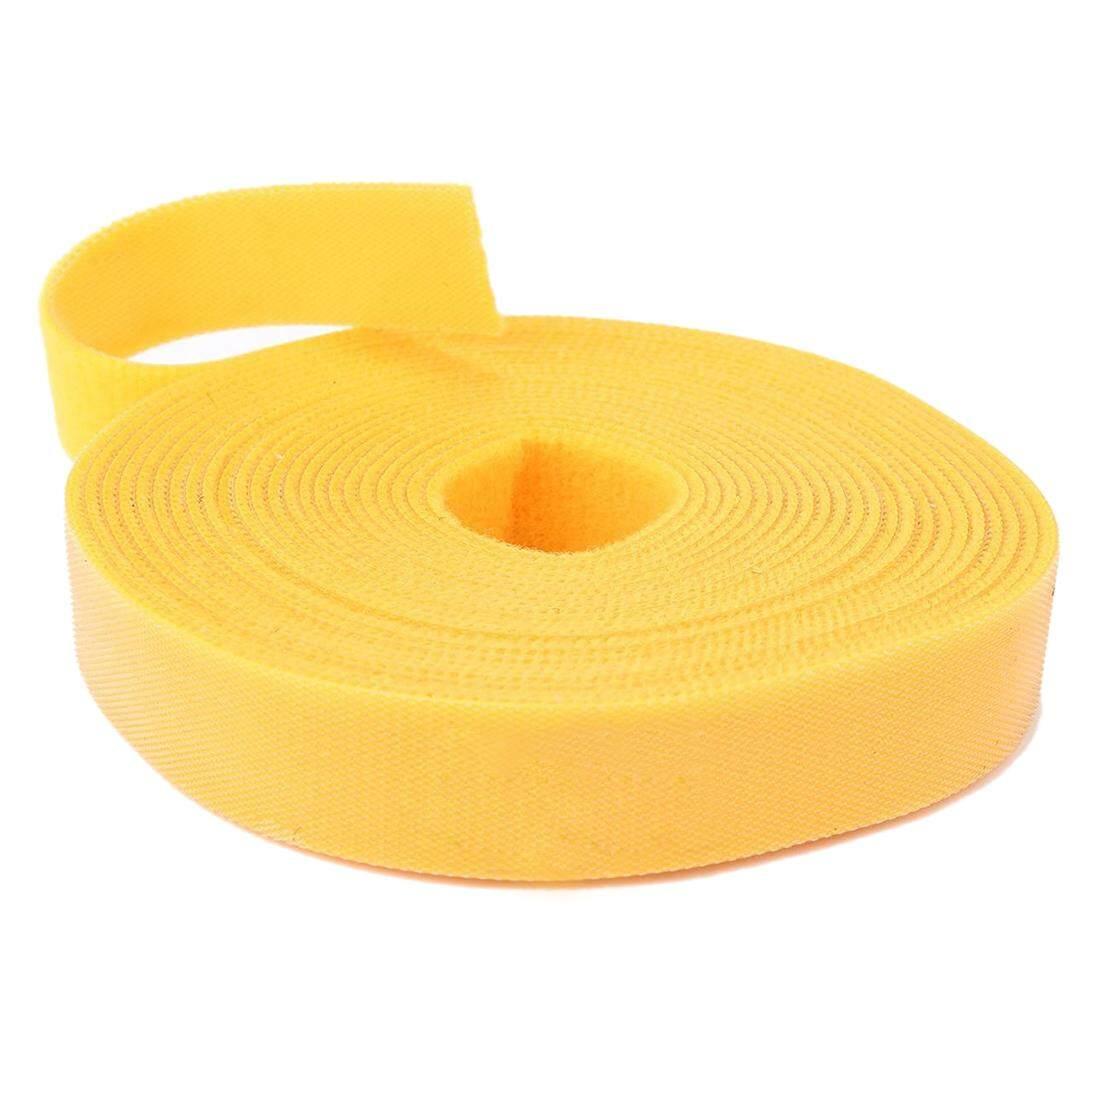 Long Fastening Tape 2cm Hook & Loop Fastening Tape Cable Ties 5M Yellow